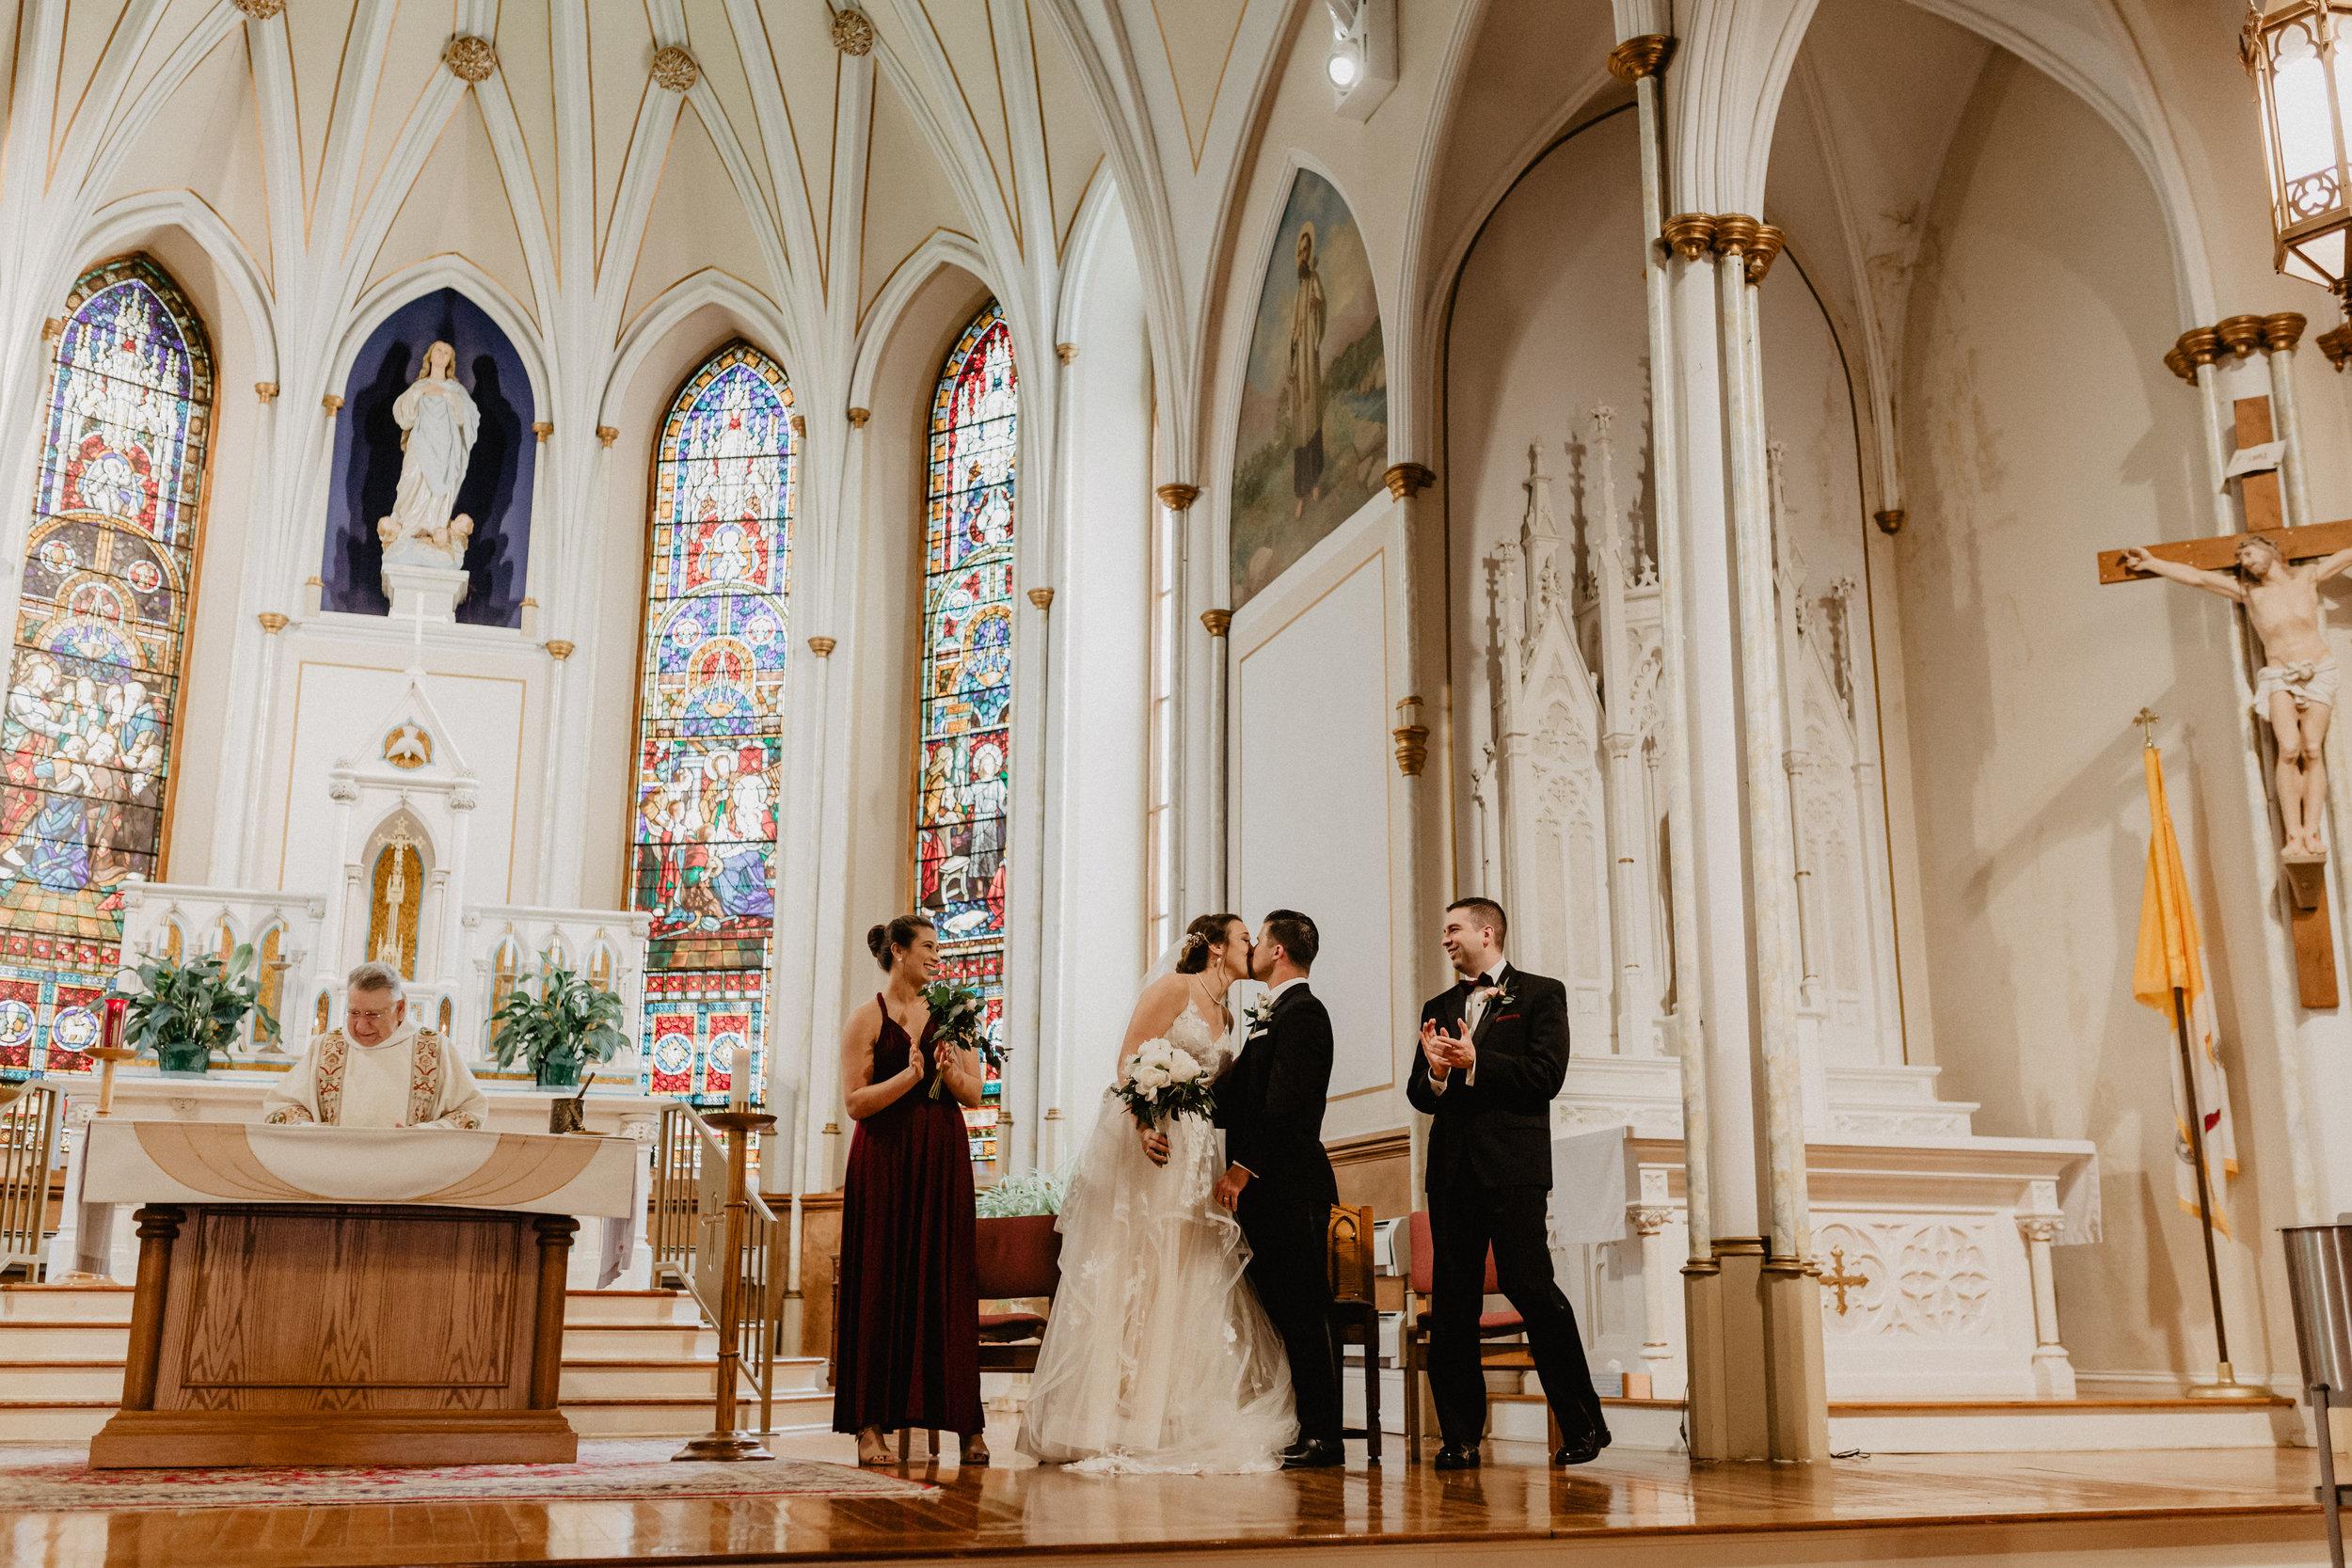 upstate_ny_wedding-30.jpg